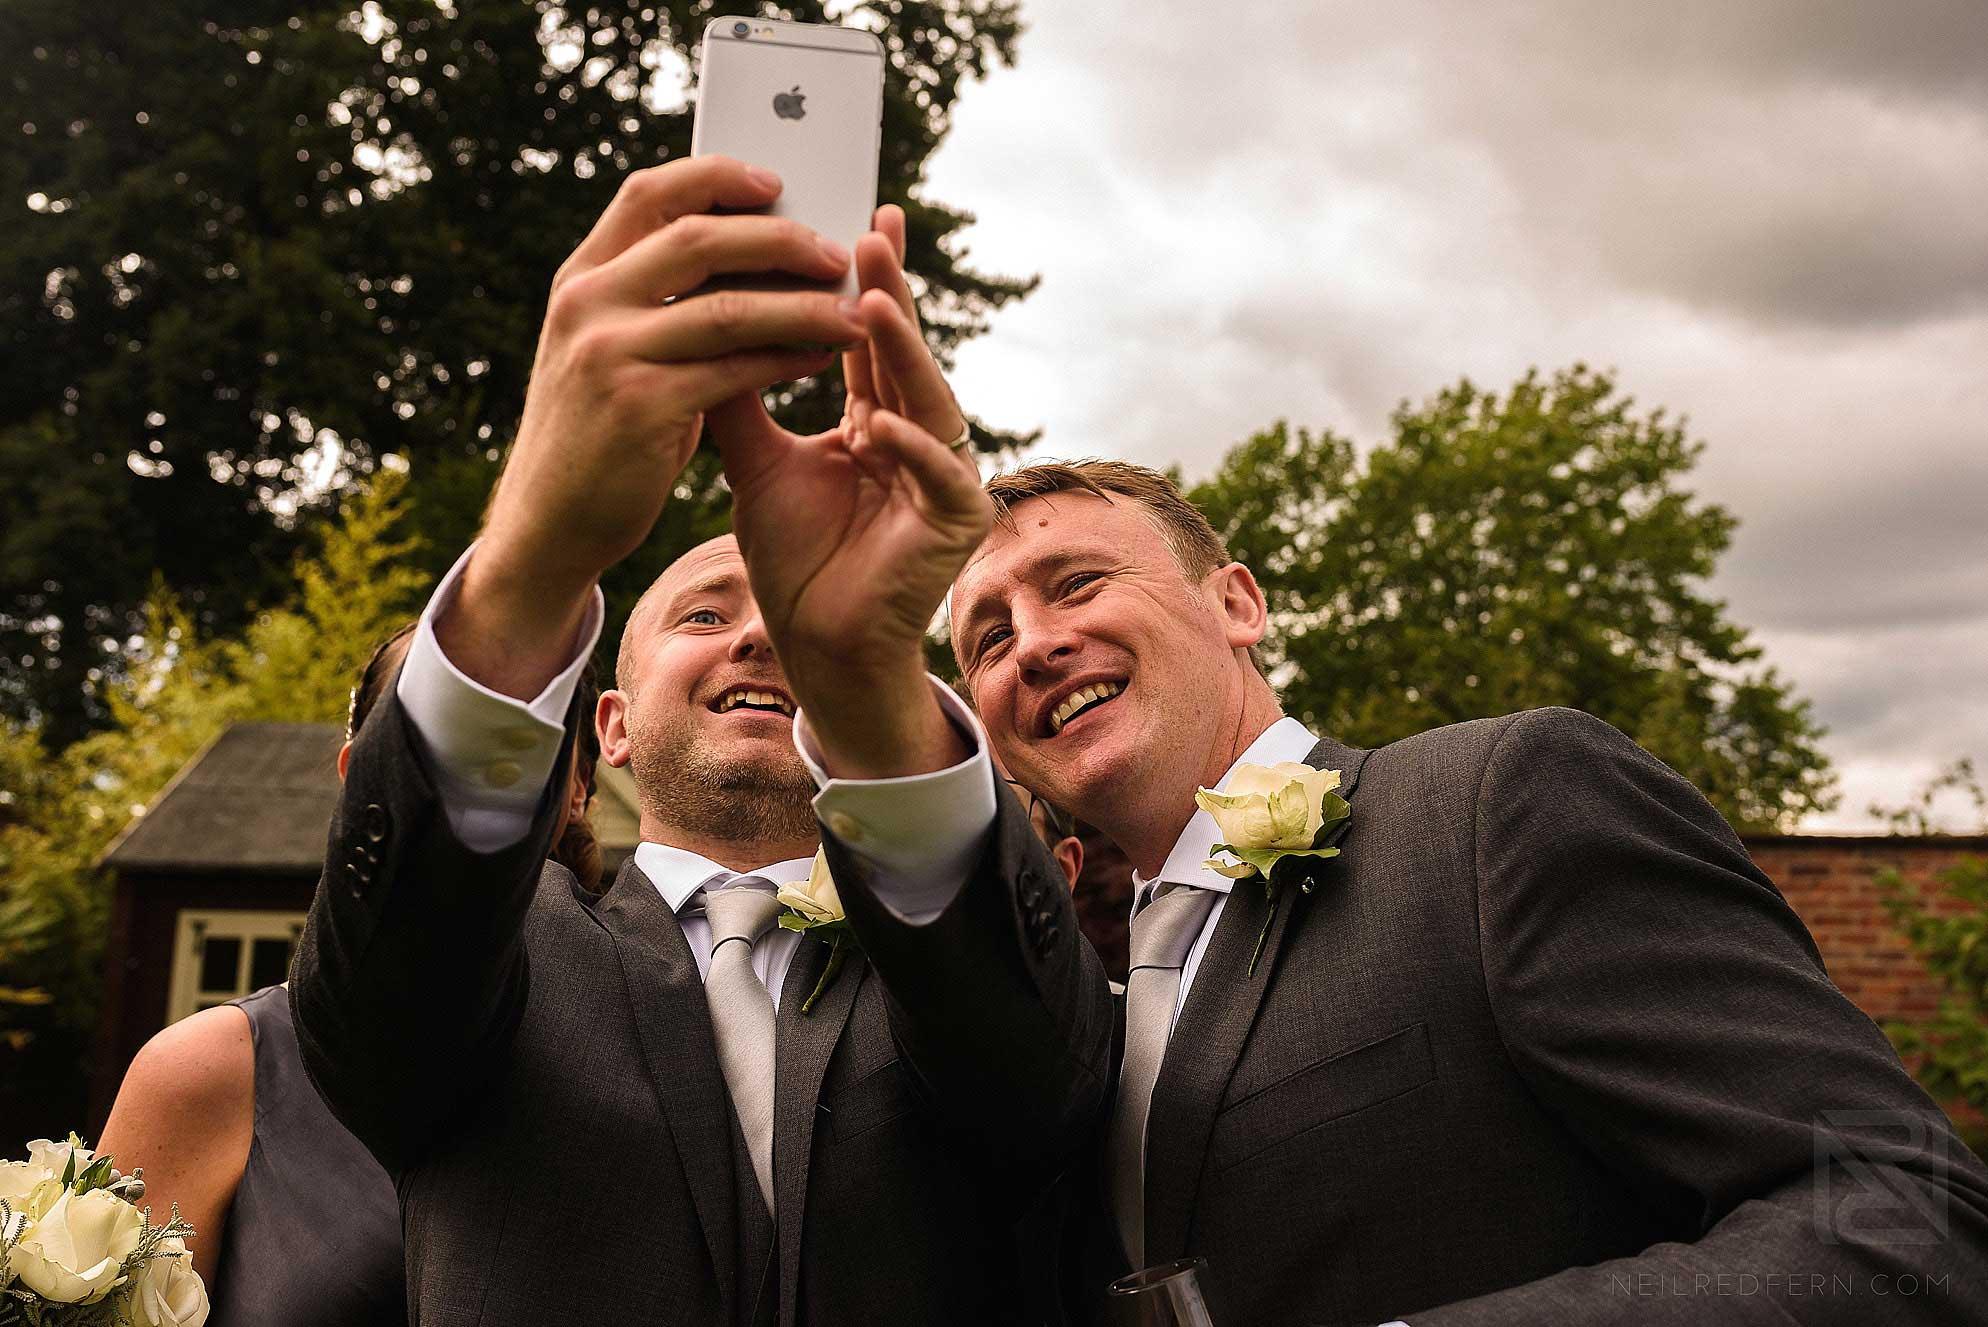 groomsmen taking photographs with phone